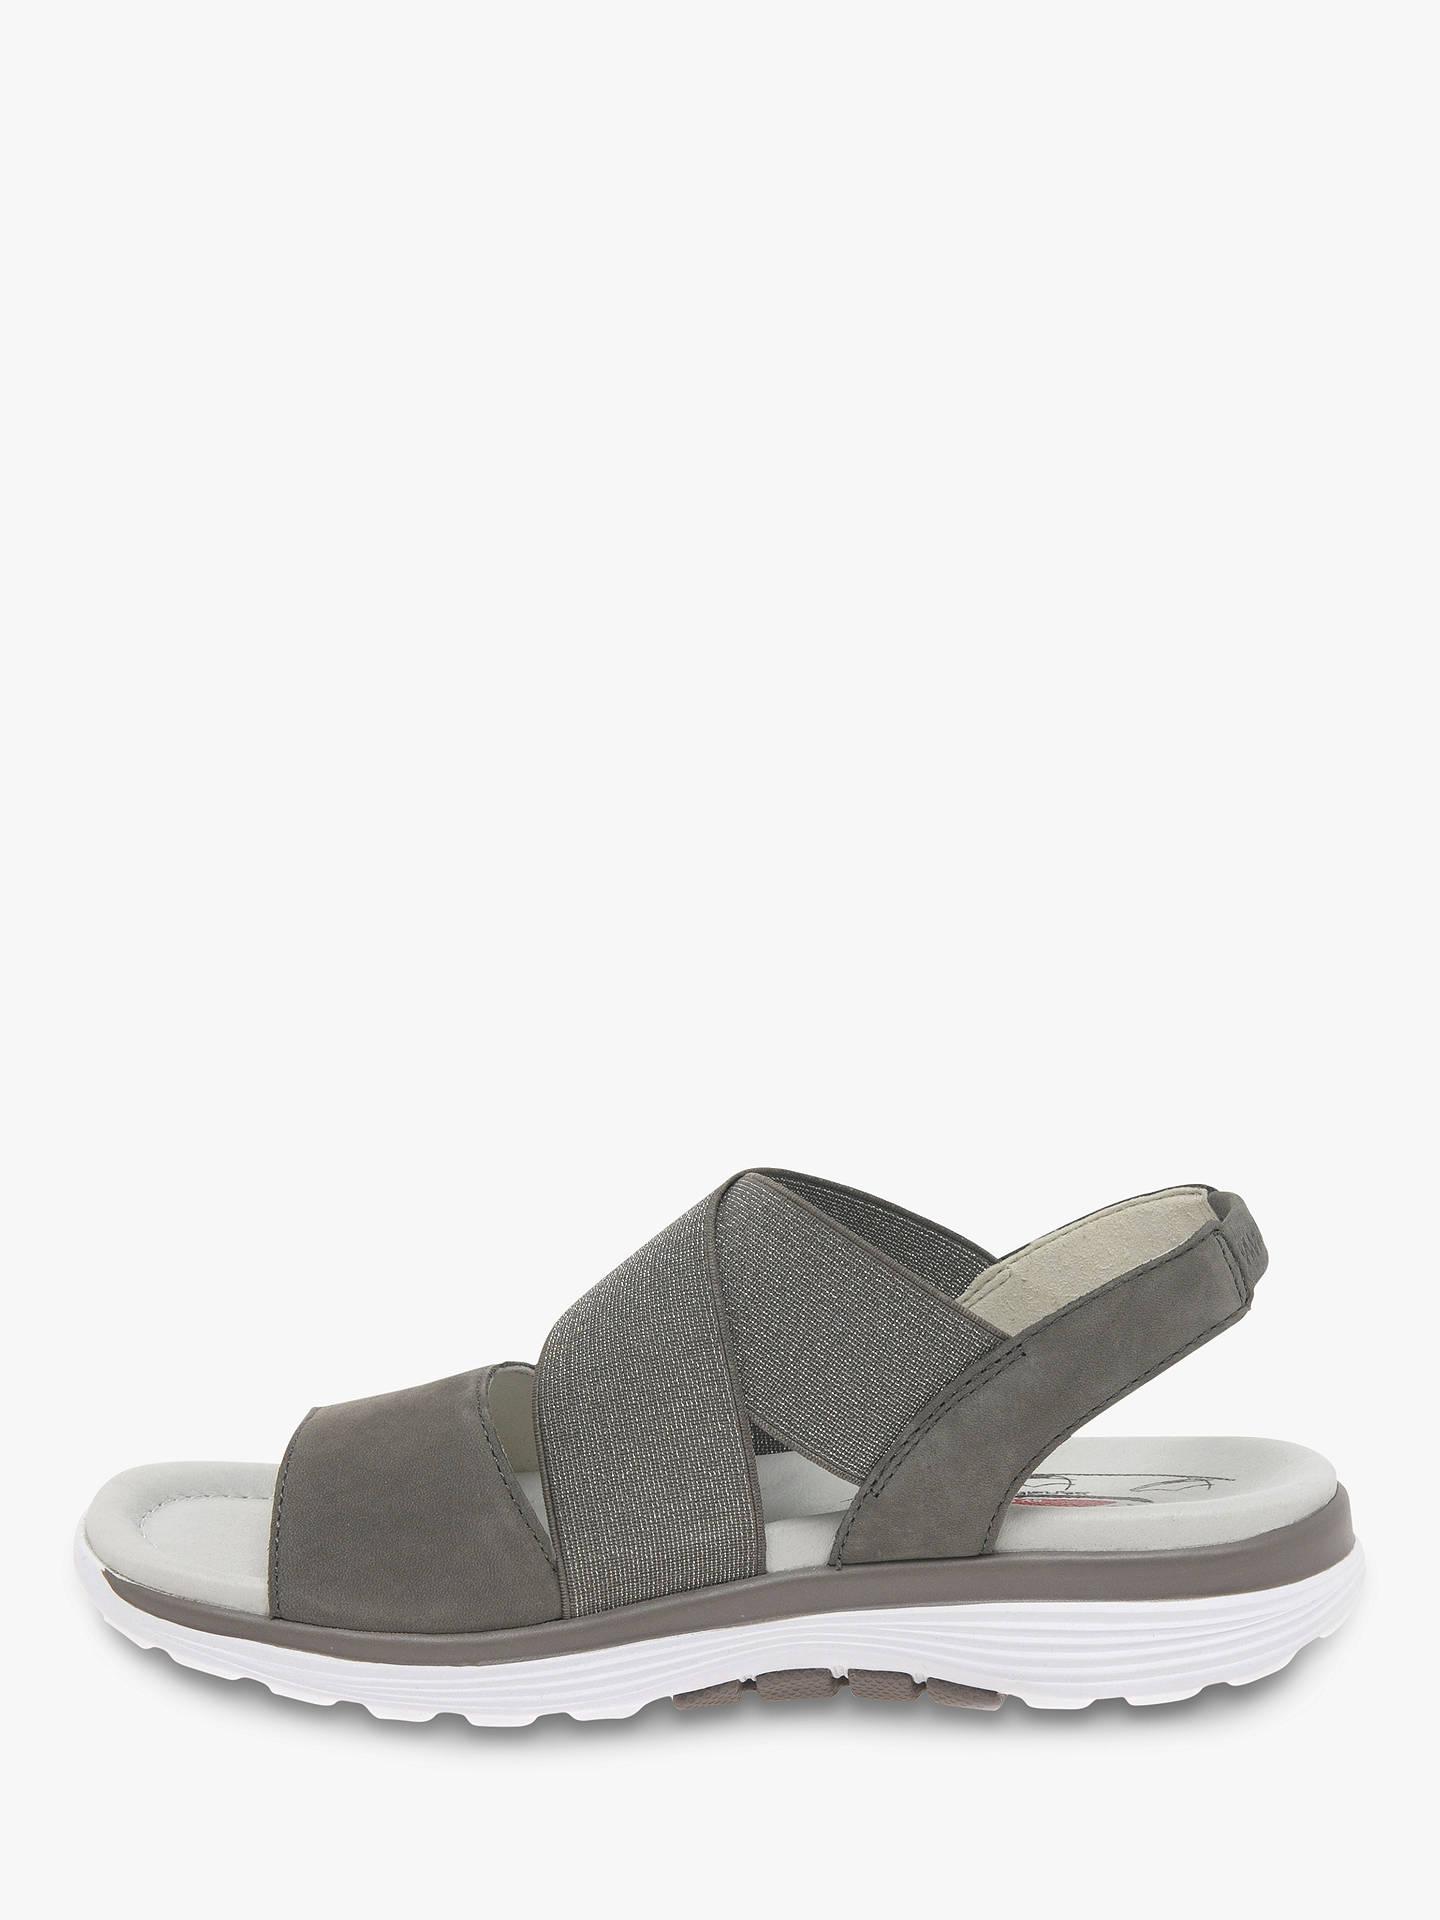 15bb2284d7a ... Buy Gabor Sacred Glitter Cross Strap Sandals